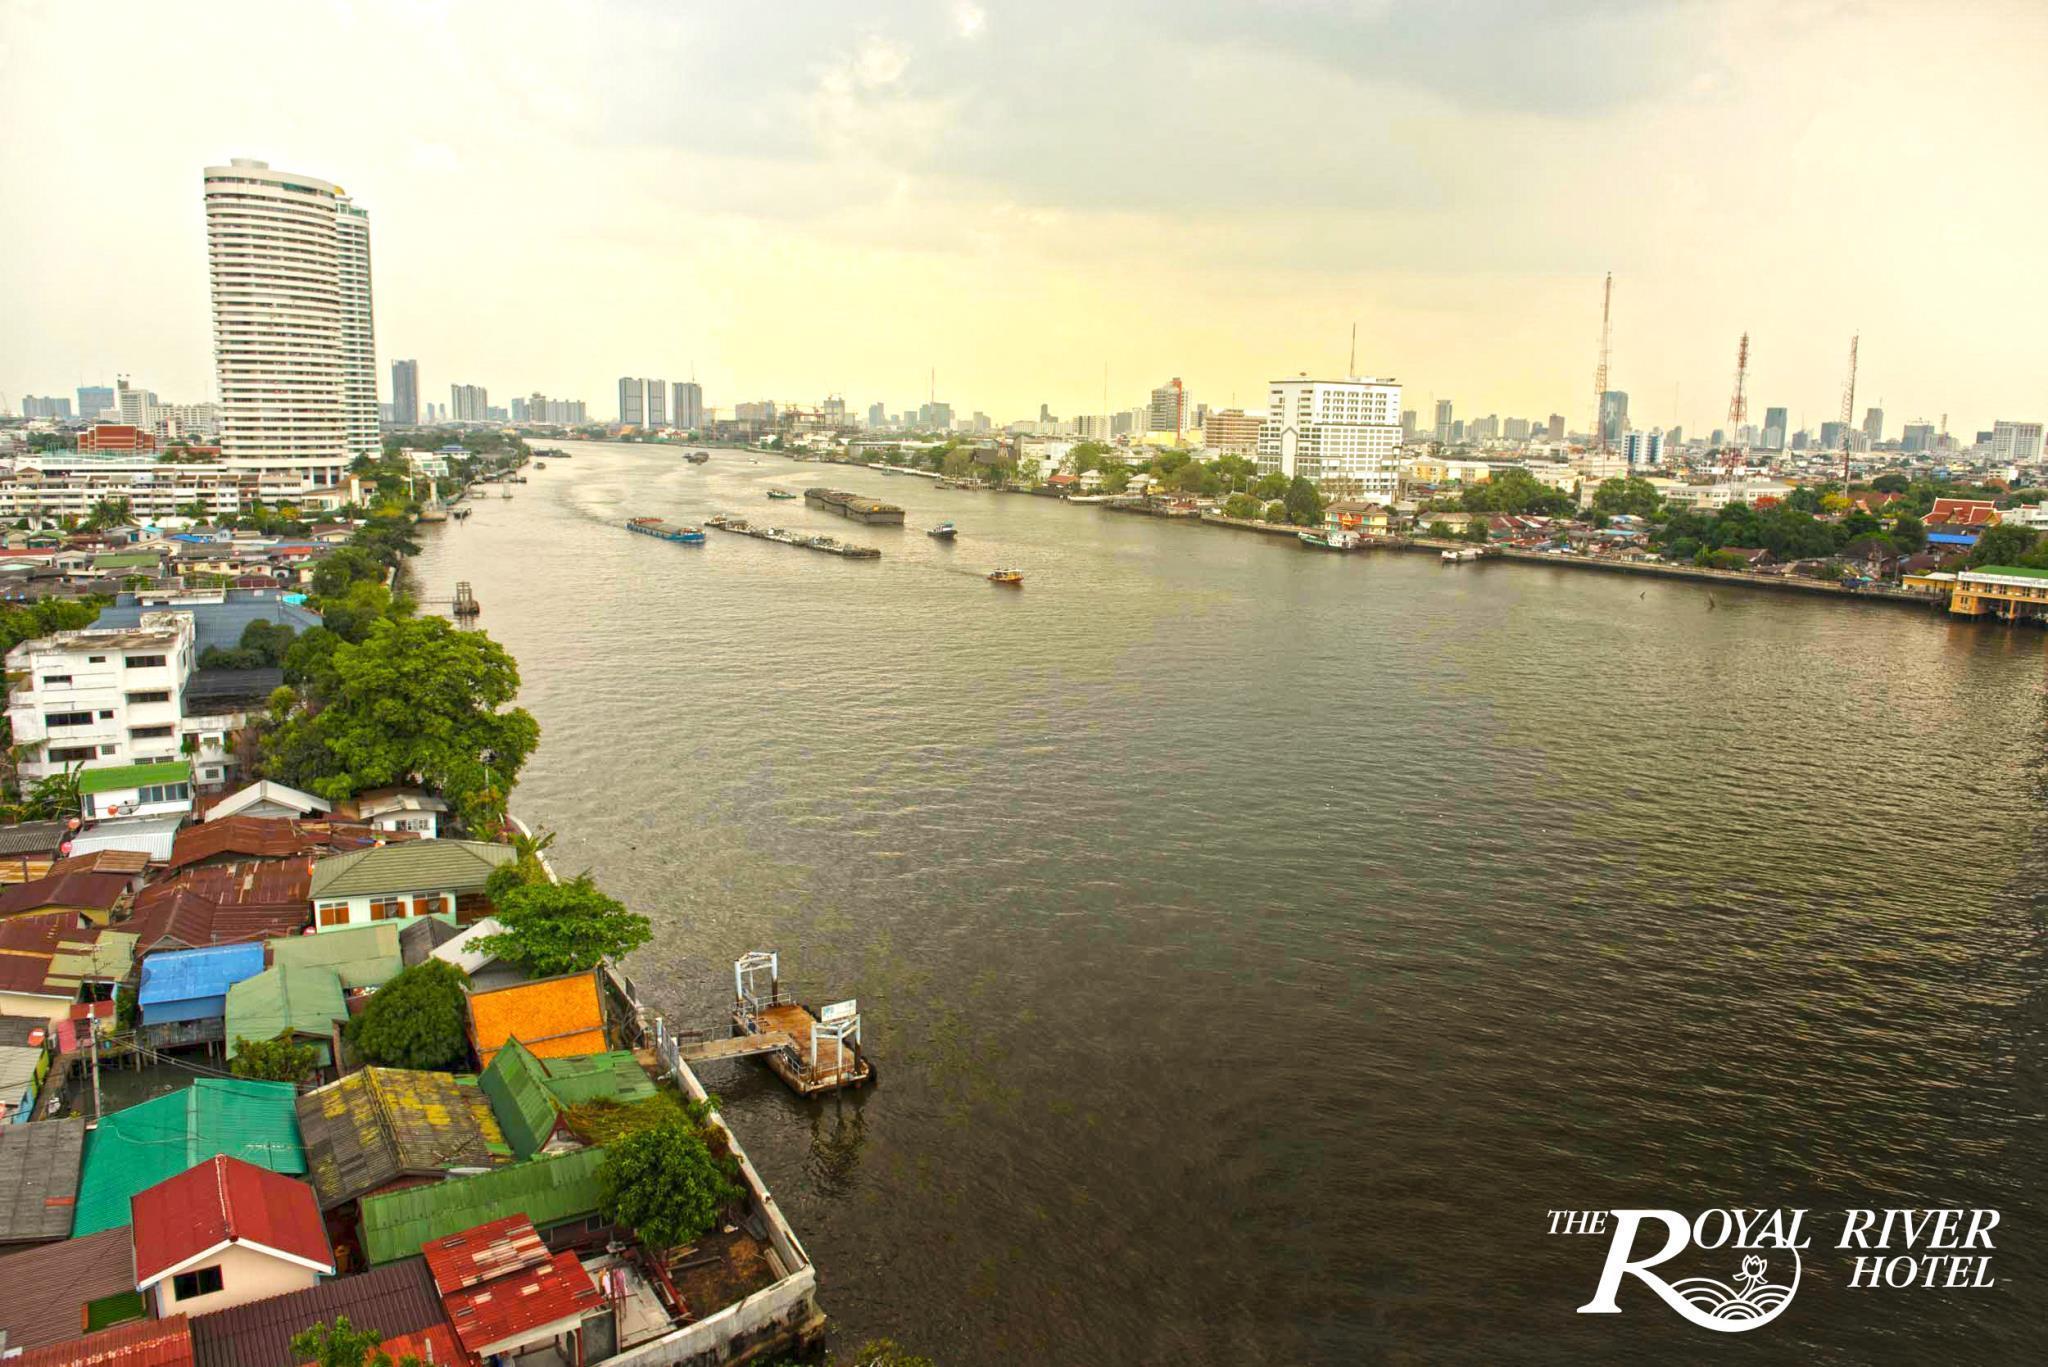 The Royal River Hotel โรงแรม เดอะ รอยัล ริเวอร์